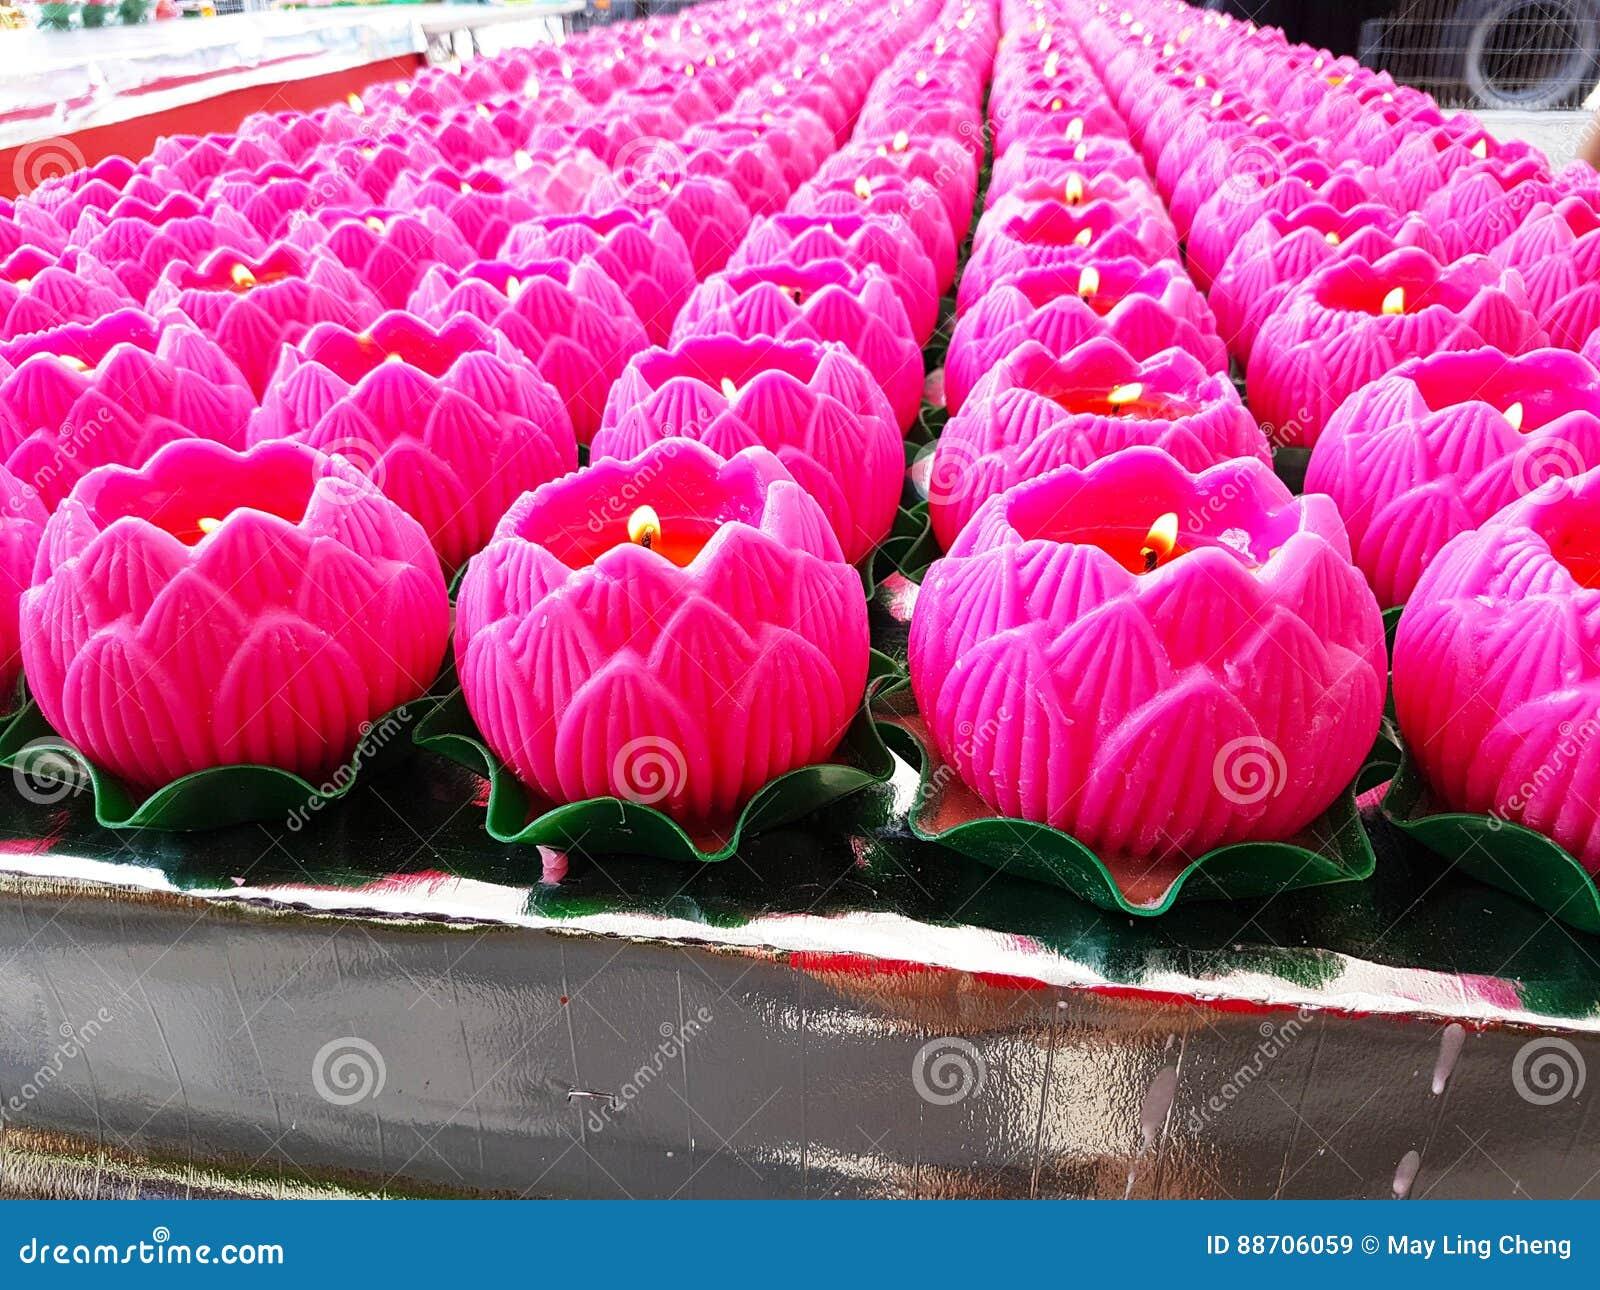 Lotus Flower Candles For Praying Stock Image - Image of